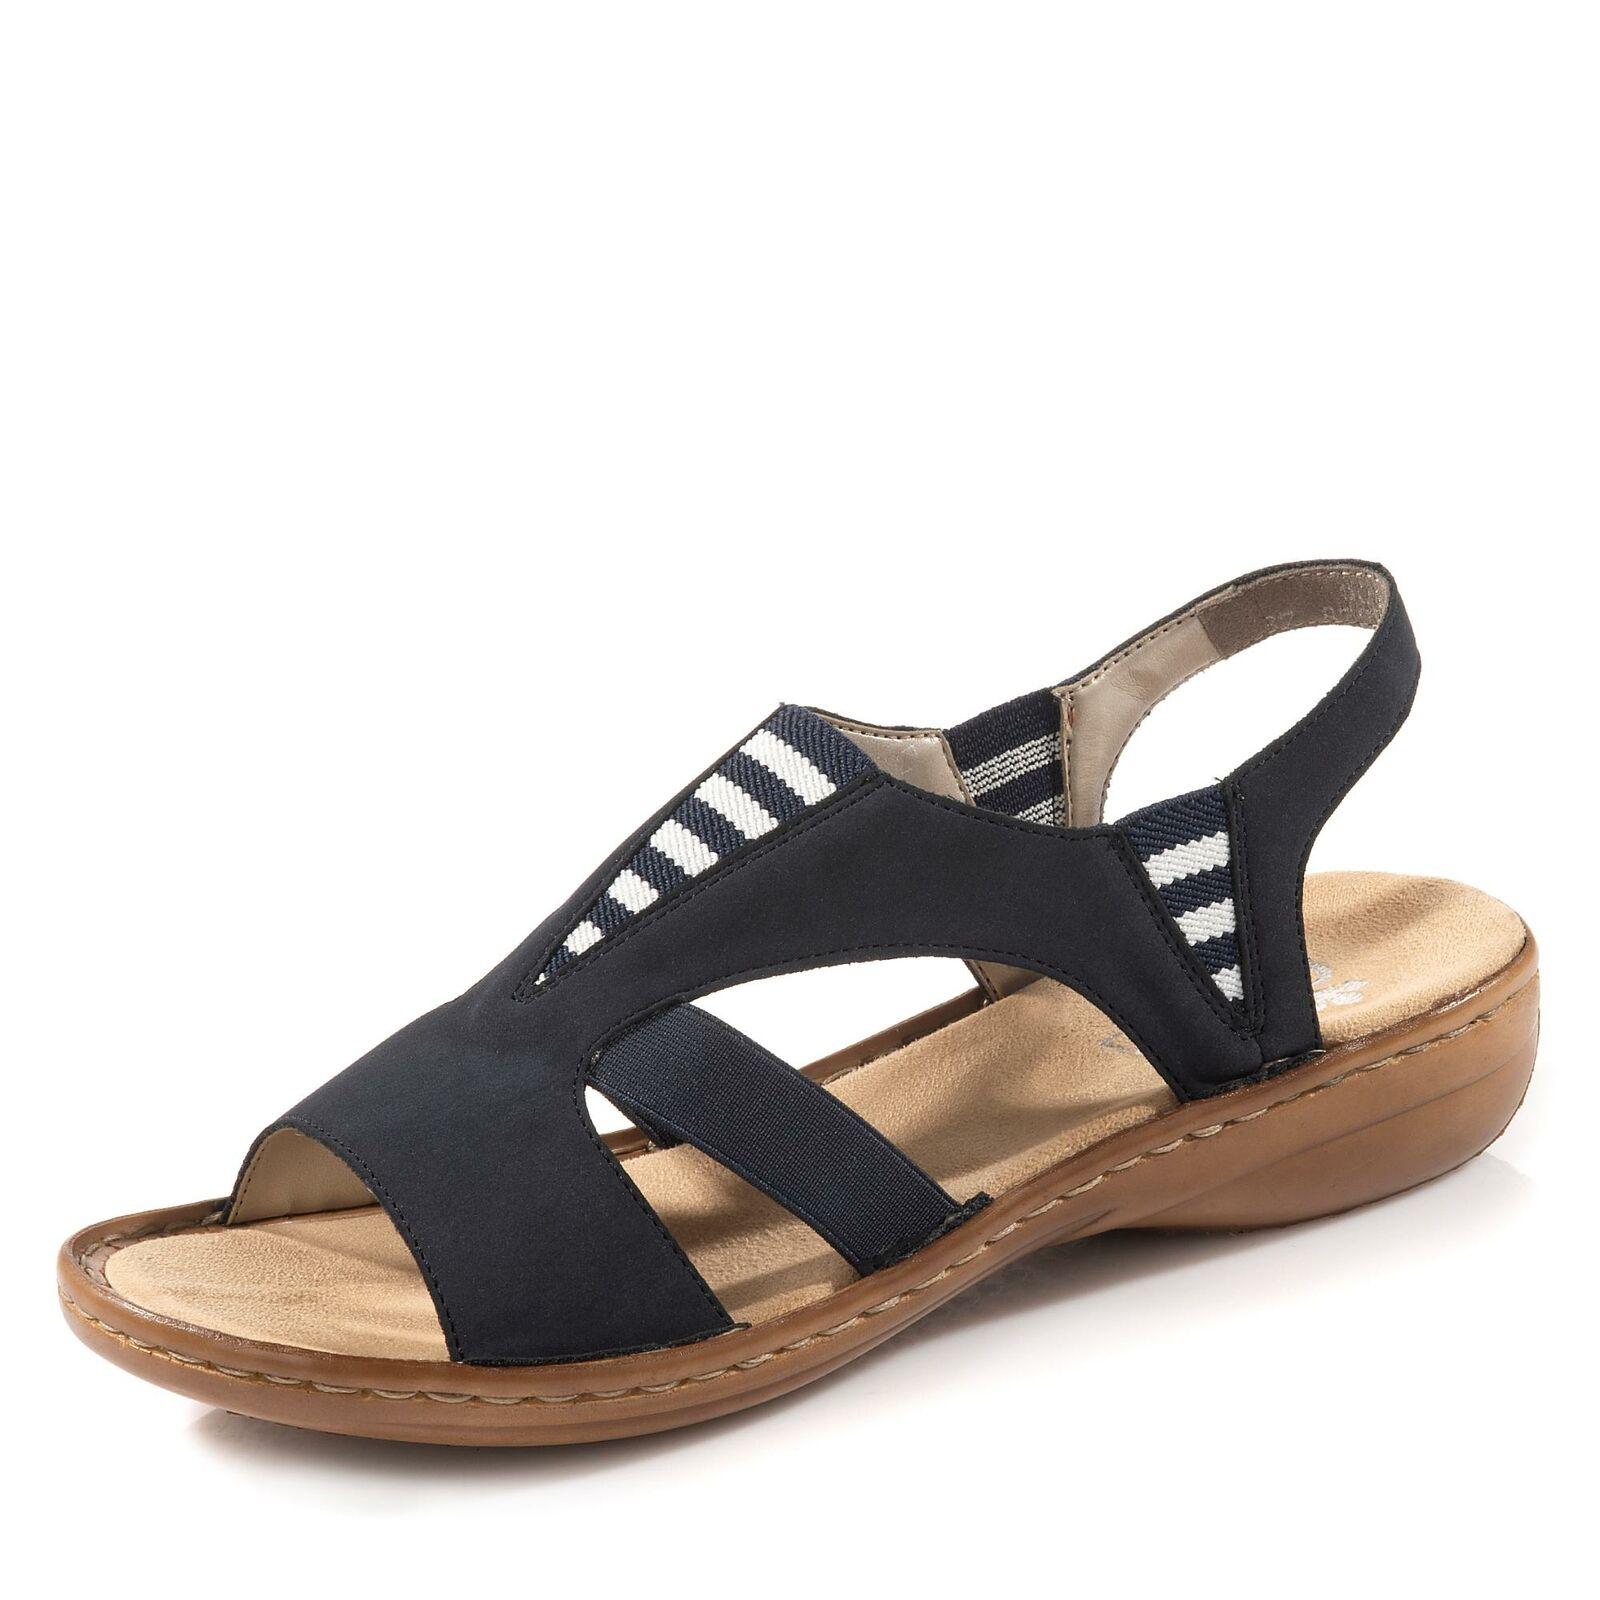 Rieker Damen Sandale Sandalette Pantolette Schlupfschuh Sommerschuh Schuhe blau